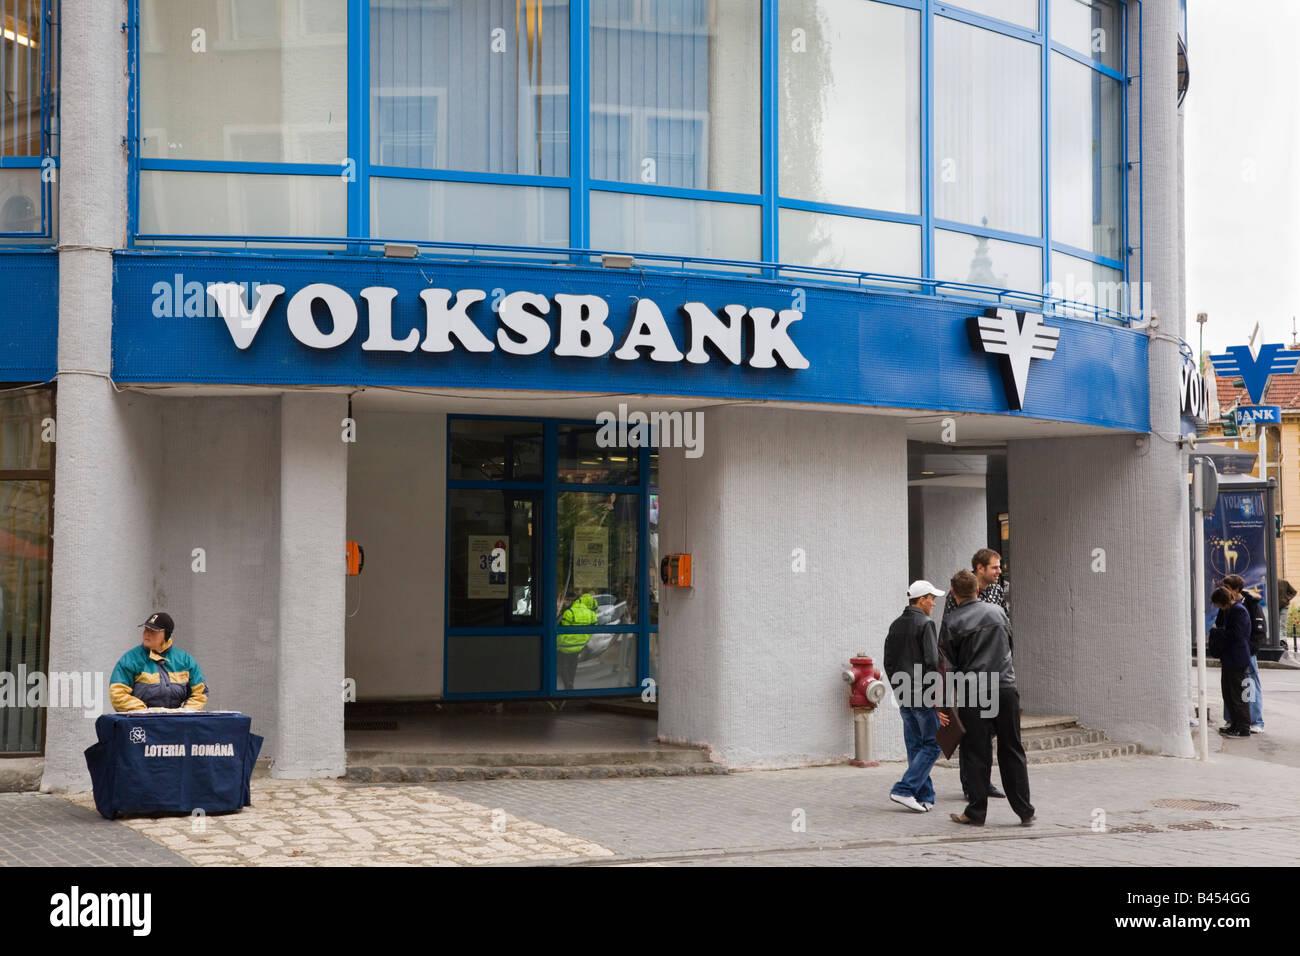 Romania Europe VolksBank retail banking branch building exterior - Stock Image